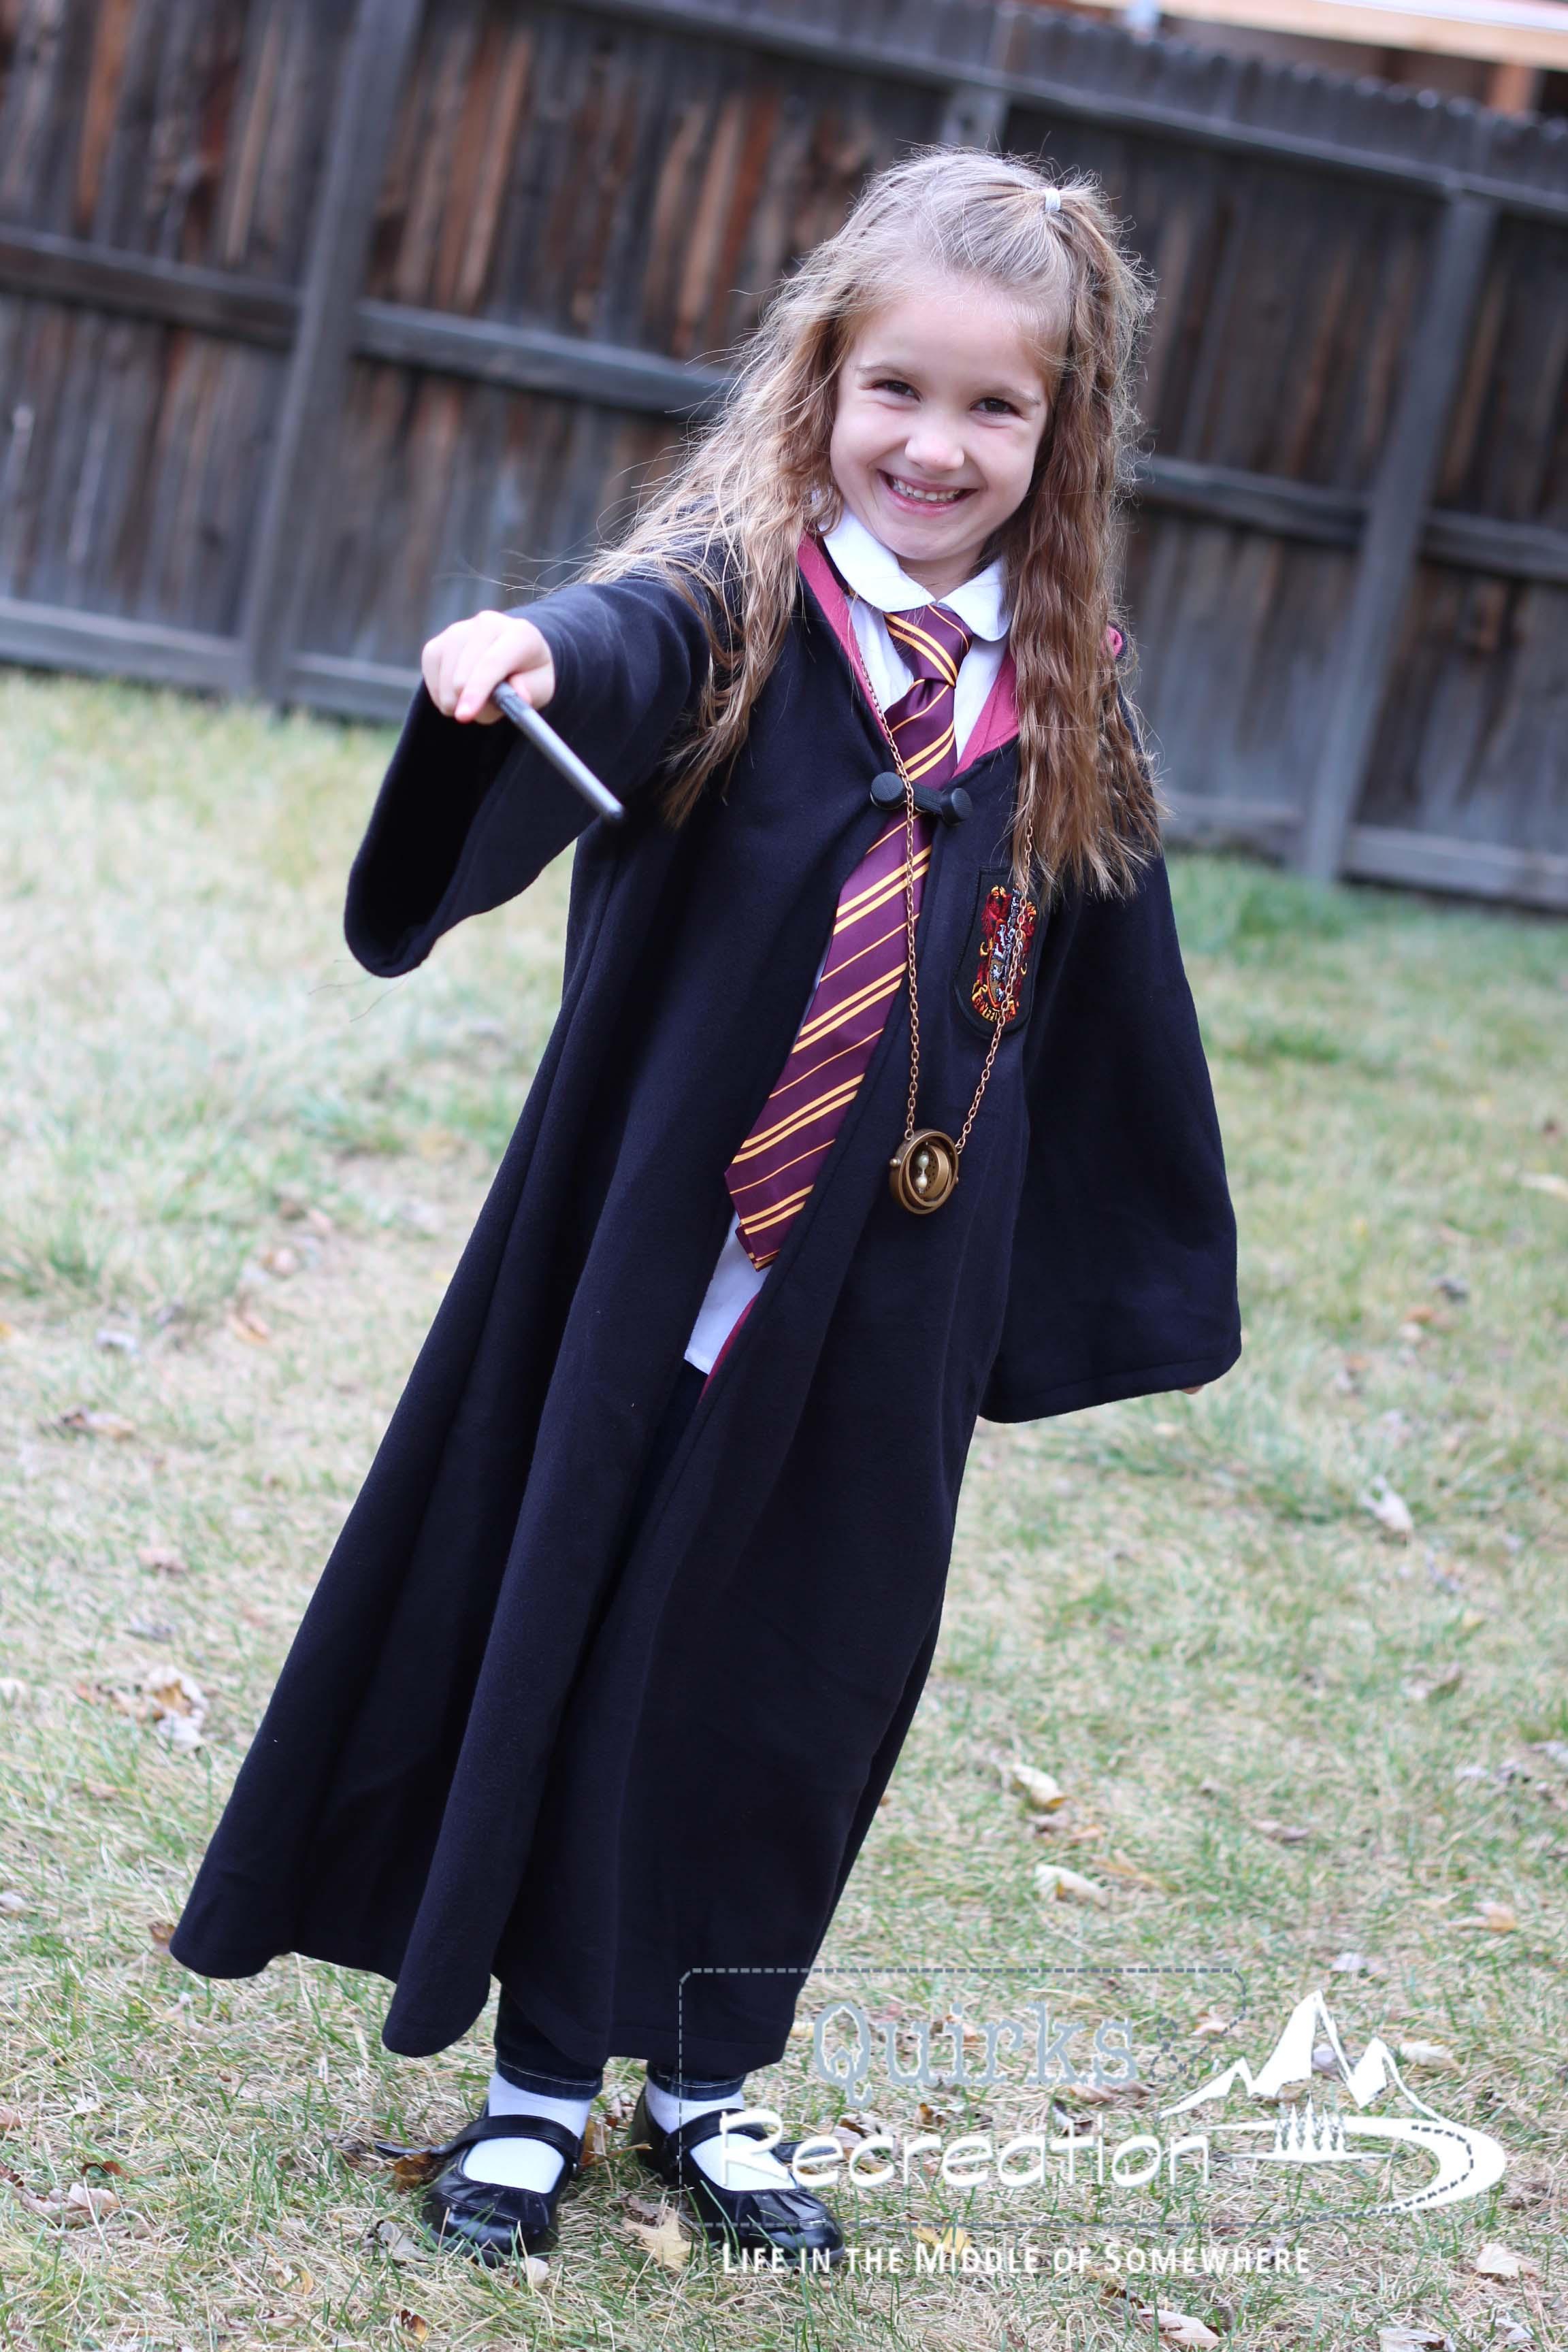 Costume Halloween Hermione.Hermione Granger Archives Quirks Recreation